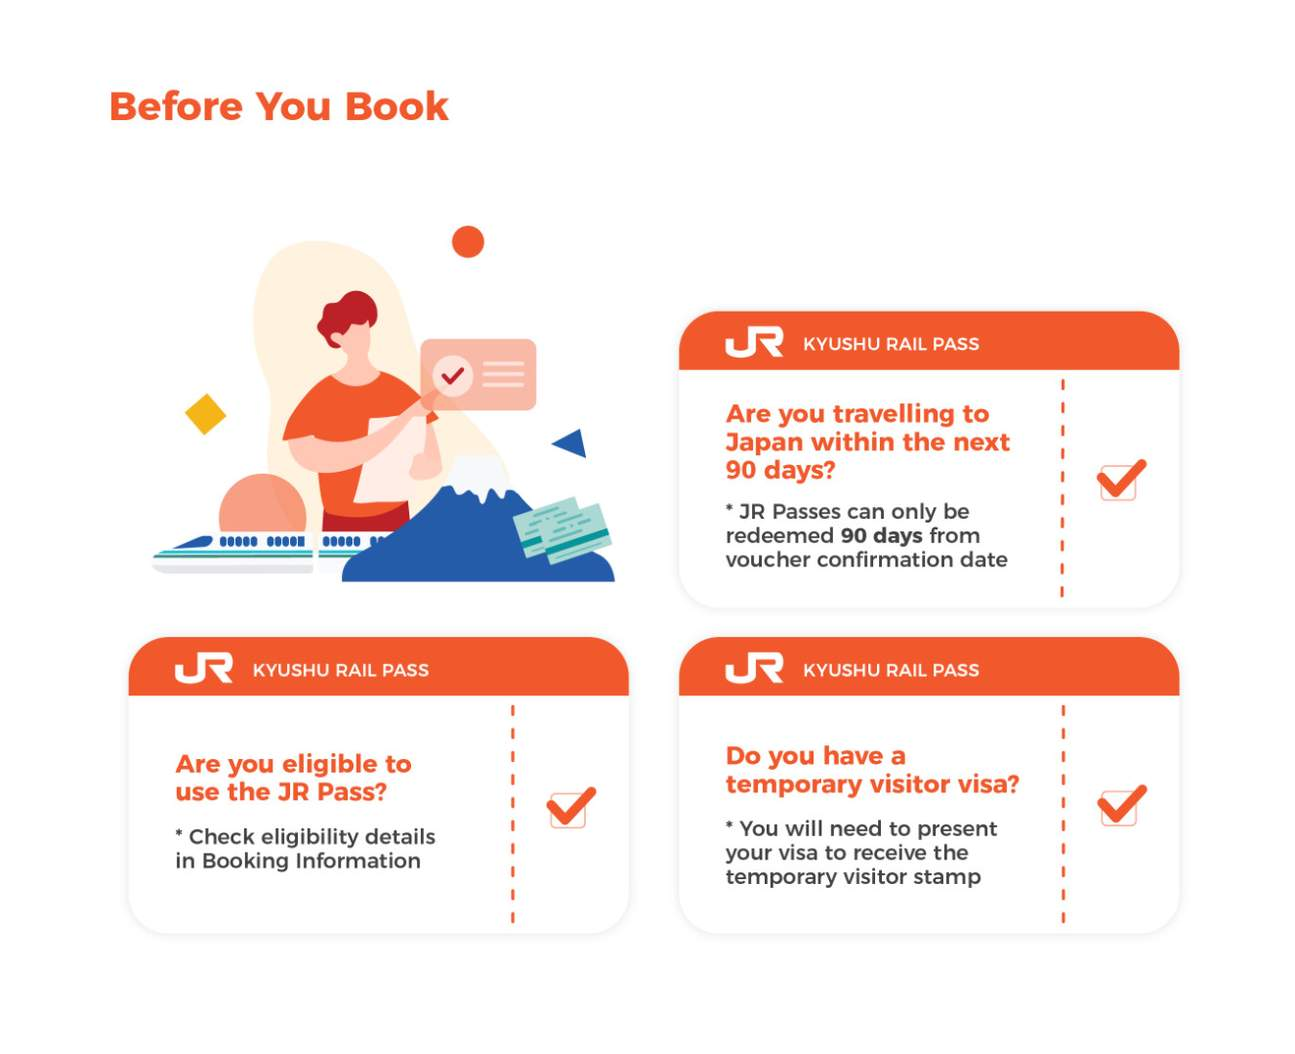 jr kyushu rail pass eligibility